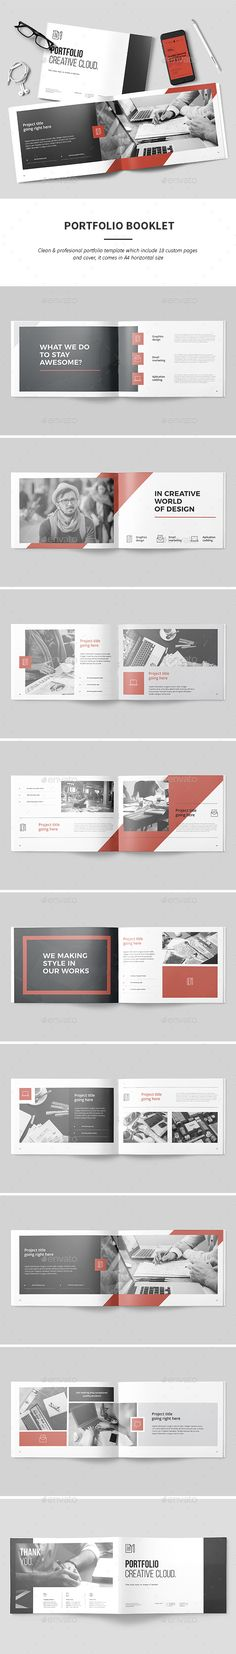 Corporate Brochure \/ Portfolio Corporate brochure, Brochures and - company brochure templates